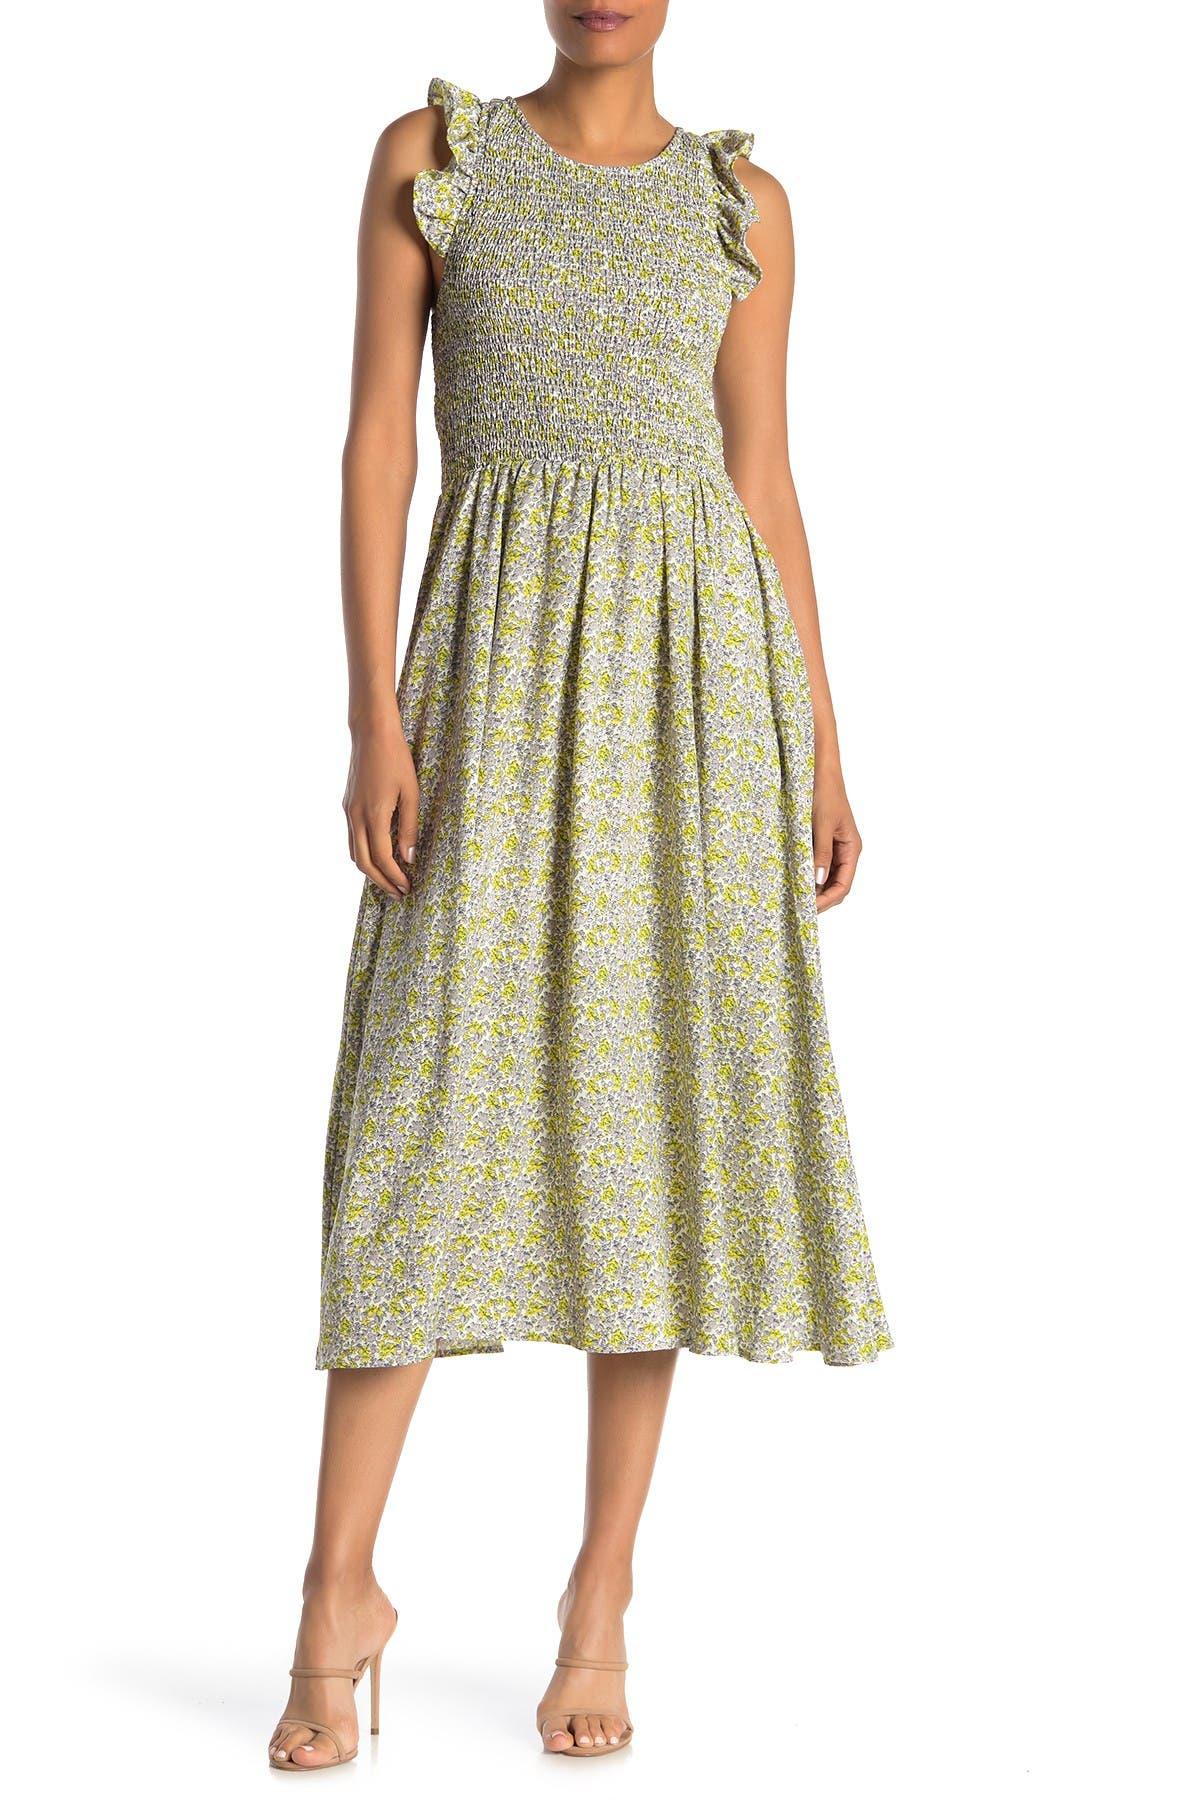 Image of MELLODAY Smocked Cap Sleeve Maxi Dress